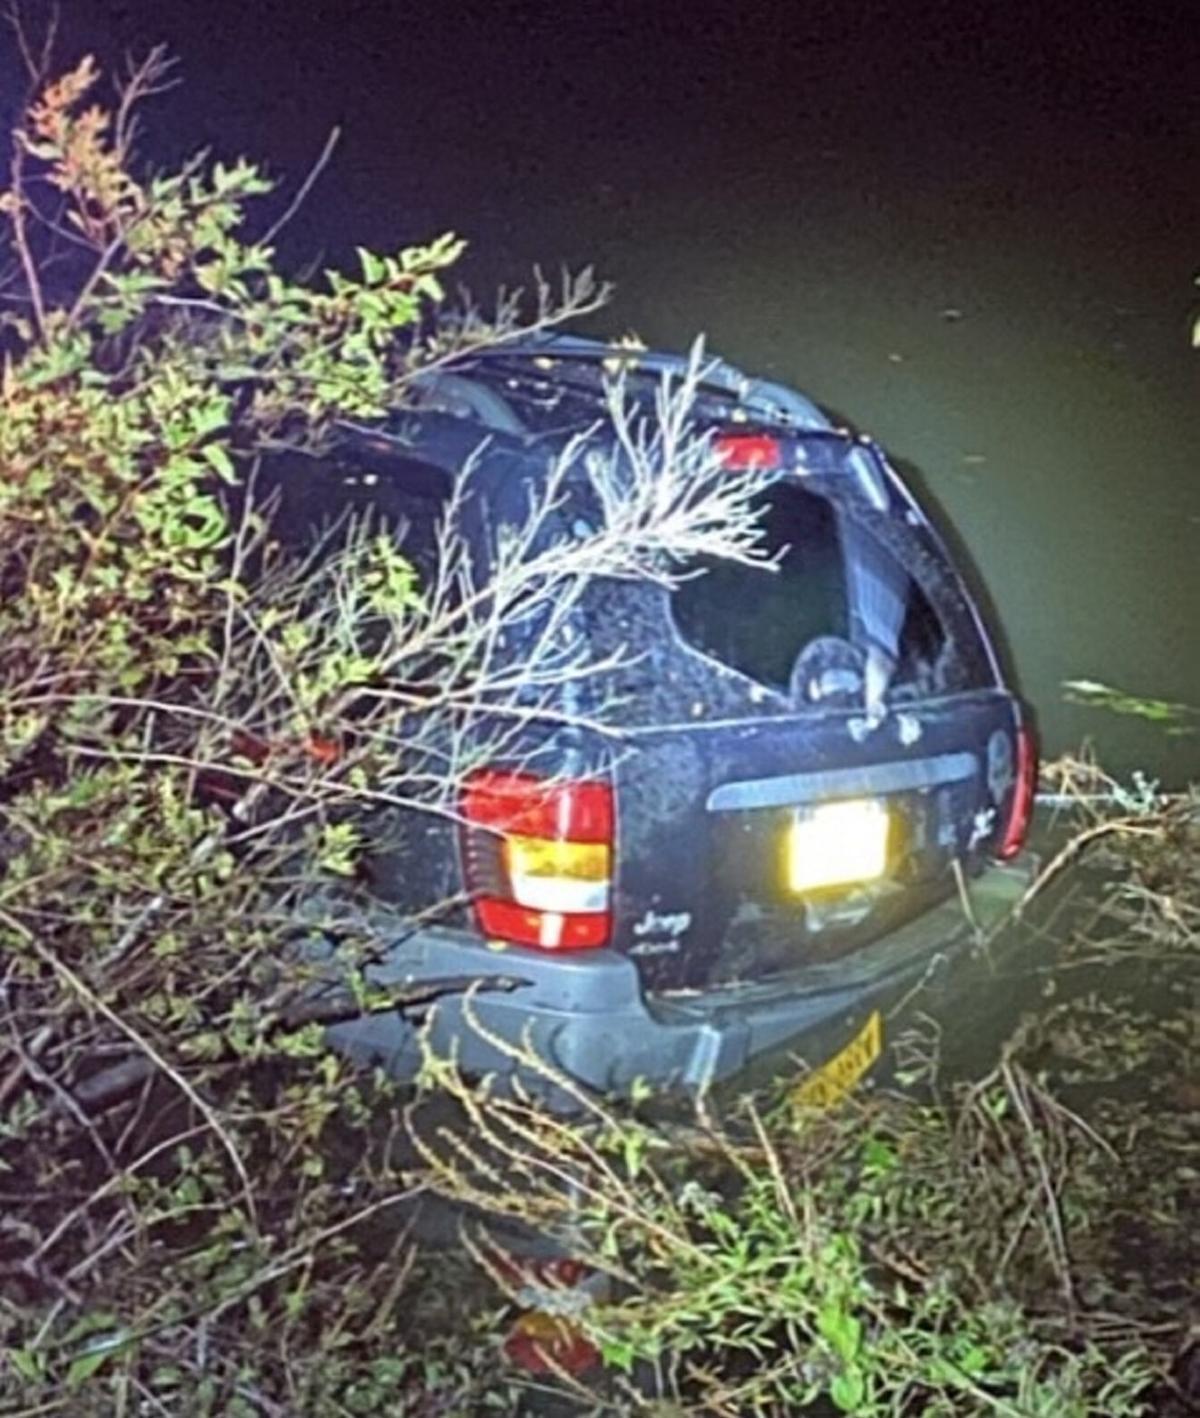 Man flees police, crashes into river